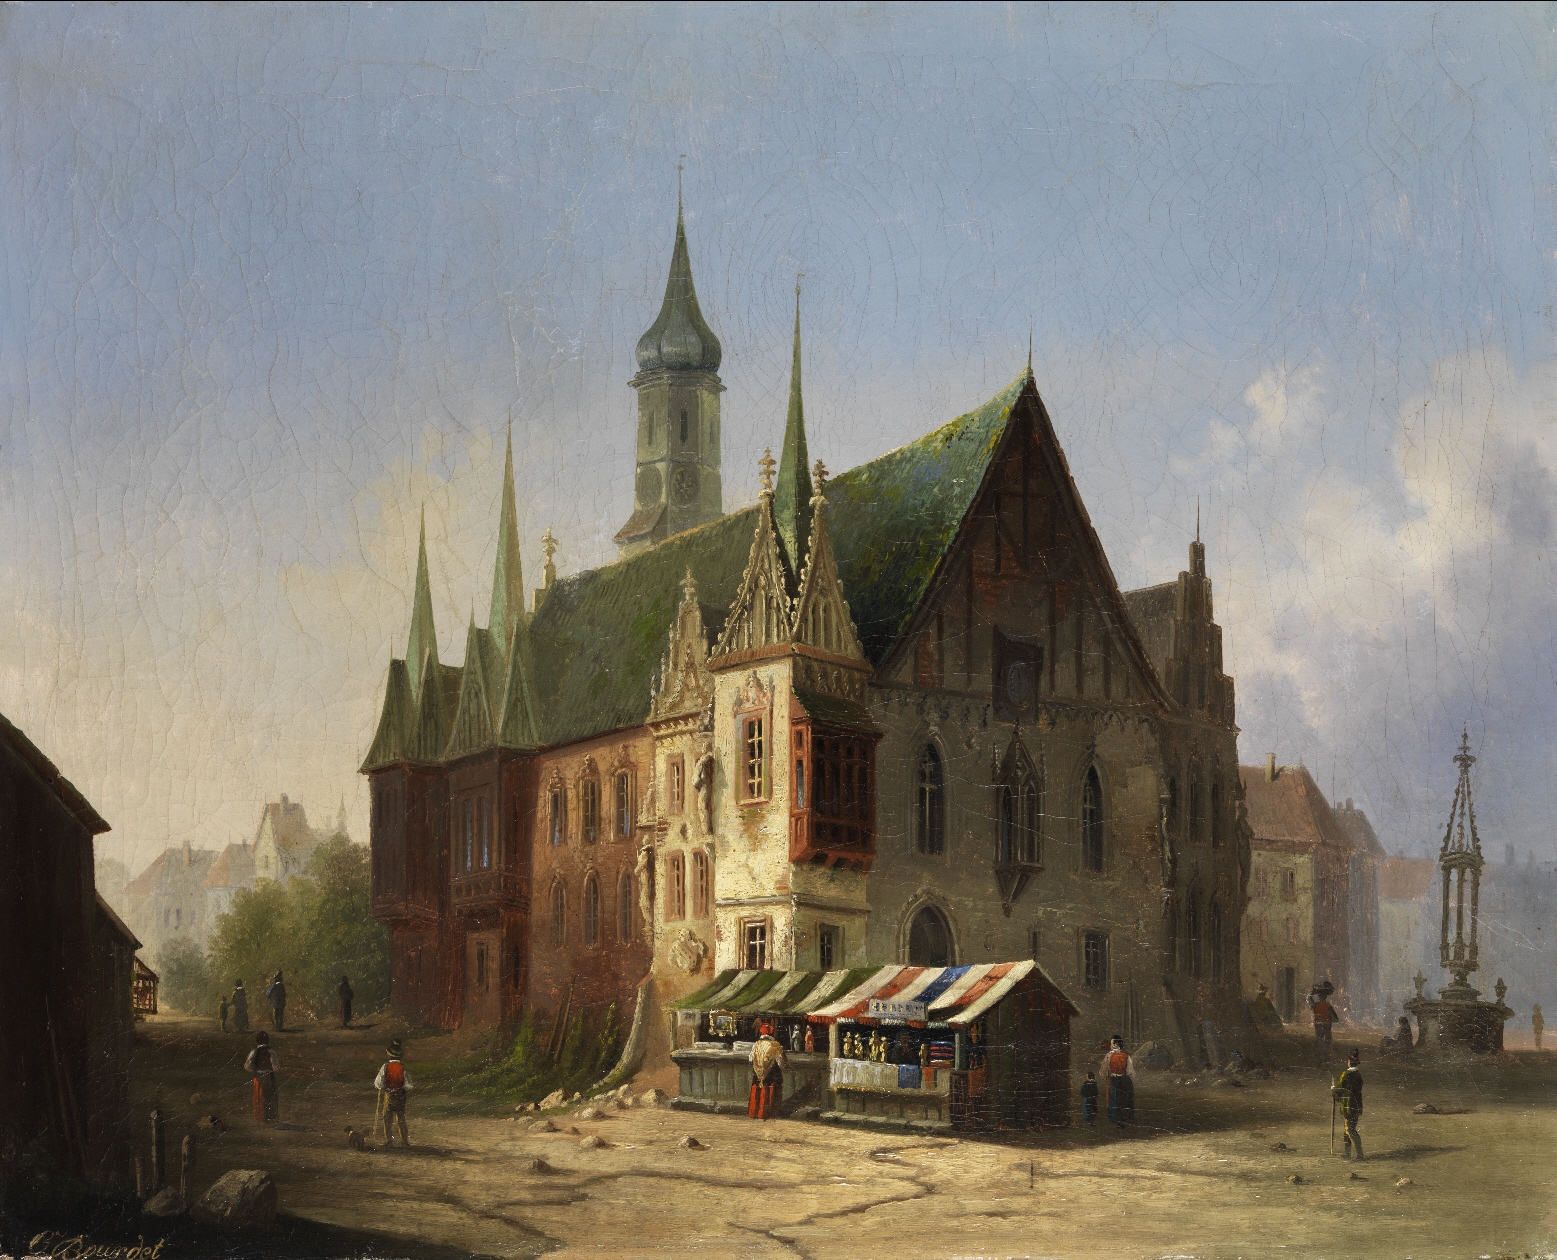 https://upload.wikimedia.org/wikipedia/commons/7/7d/Carl_Josef_Alois_Bourdet_Rathaus_in_Breslau_vor_1800.jpg